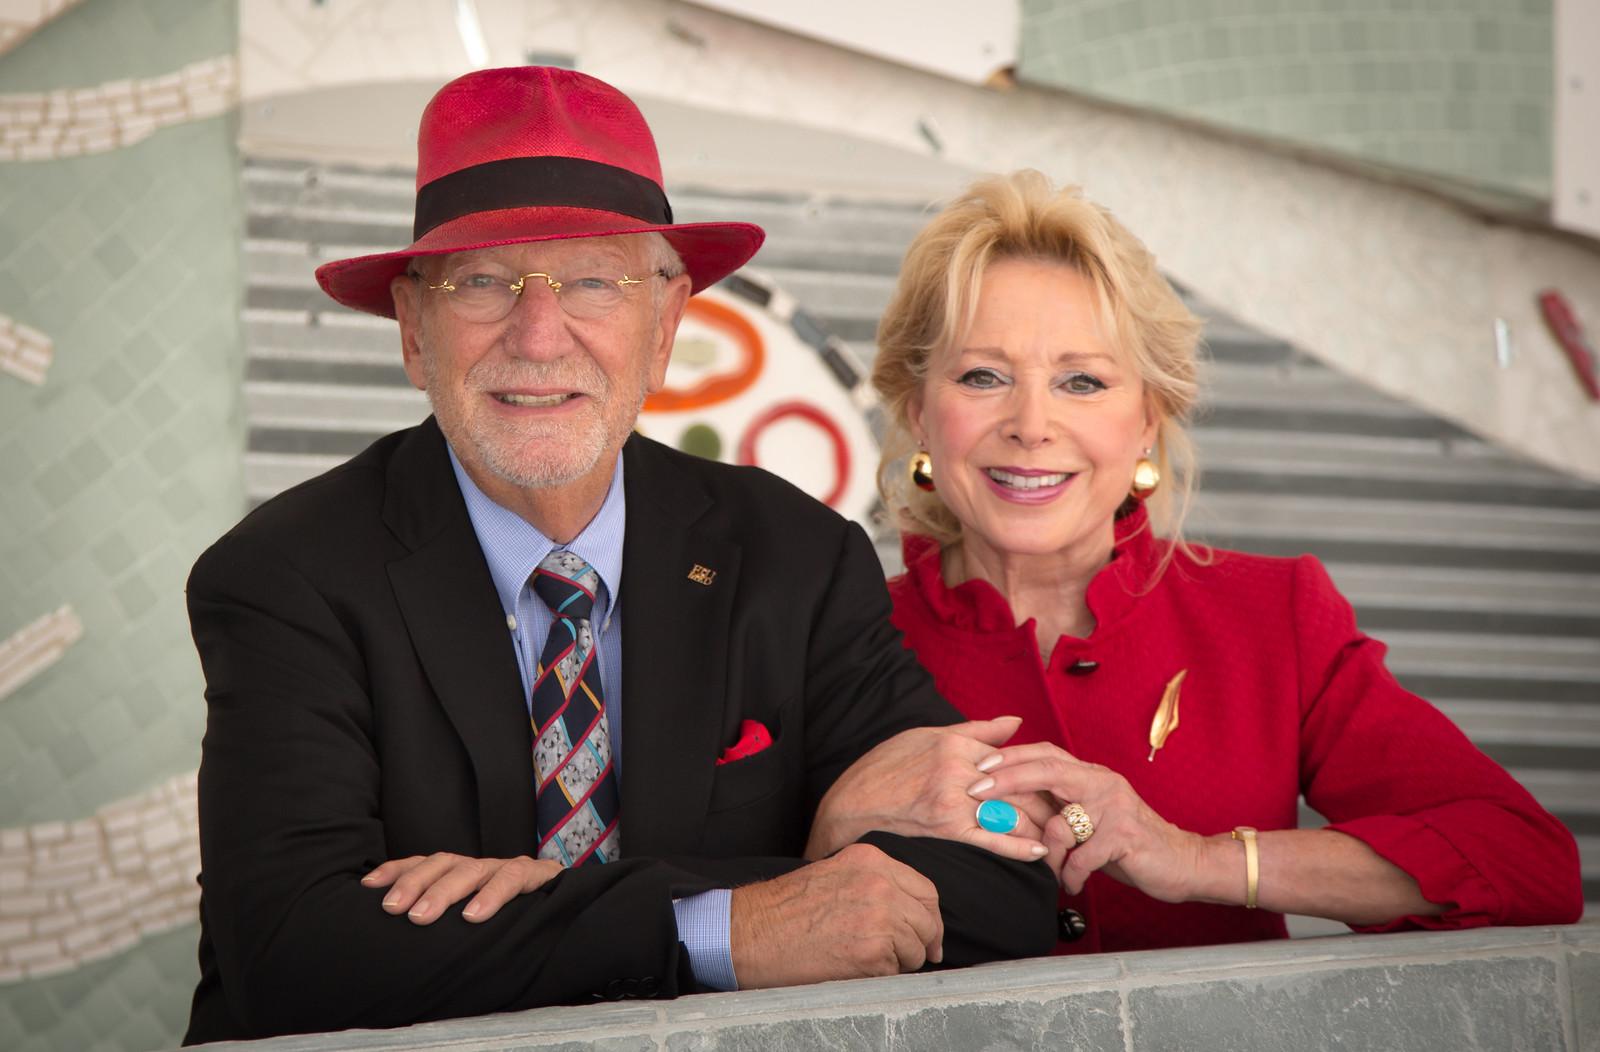 Dr. Herbert and Nicole Wertheim